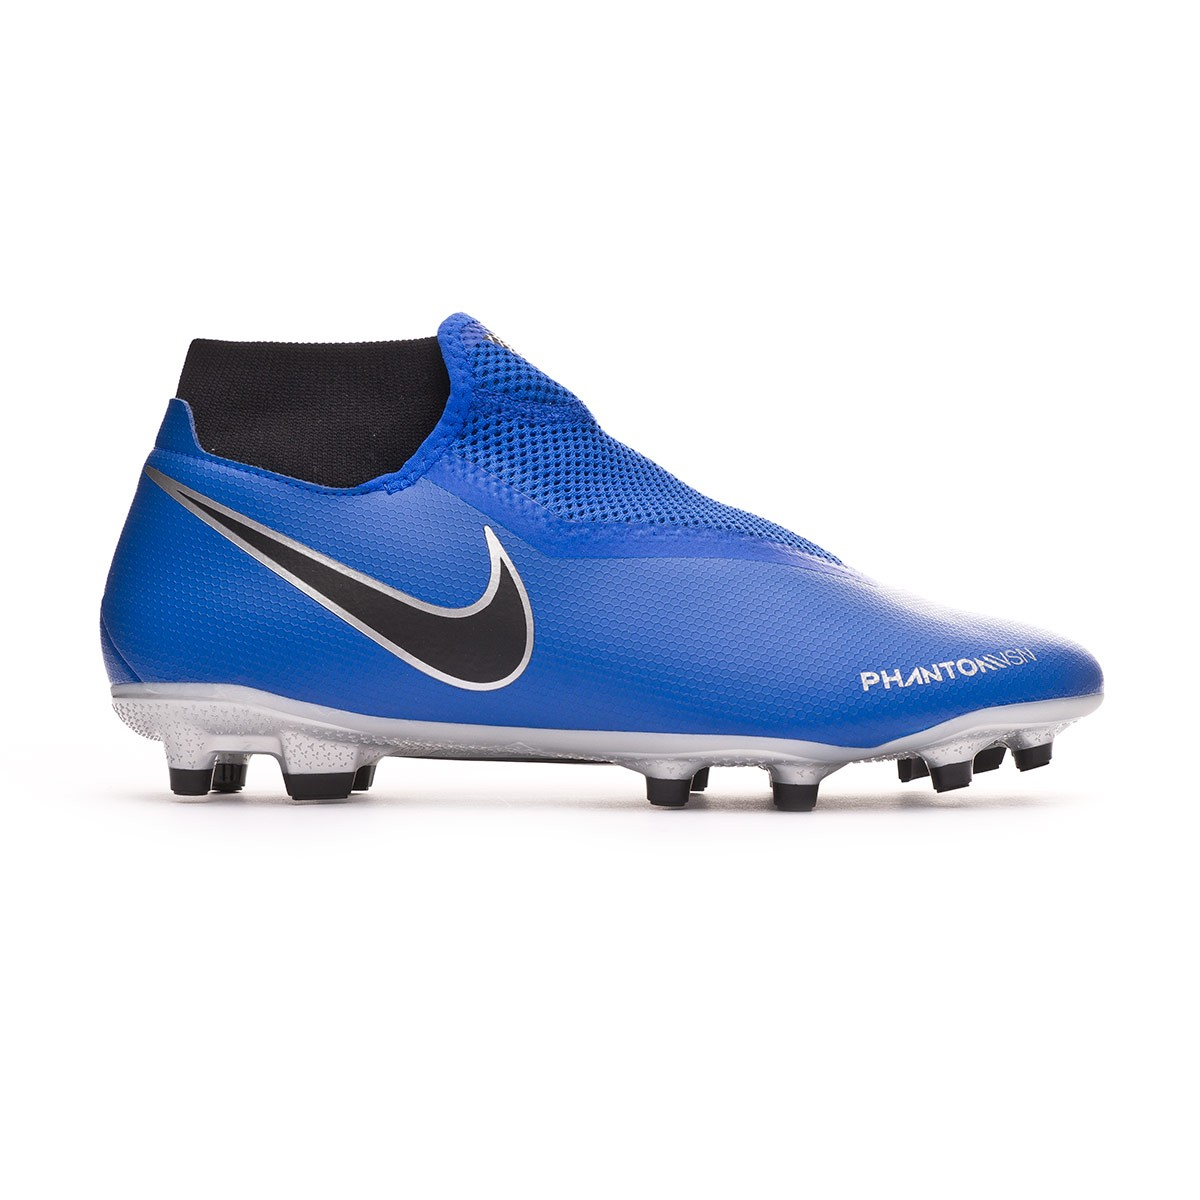 532d23b237fd1 Football Boots Nike Phantom Vision Academy DF FG MG Racer blue-Black -  Tienda de fútbol Fútbol Emotion